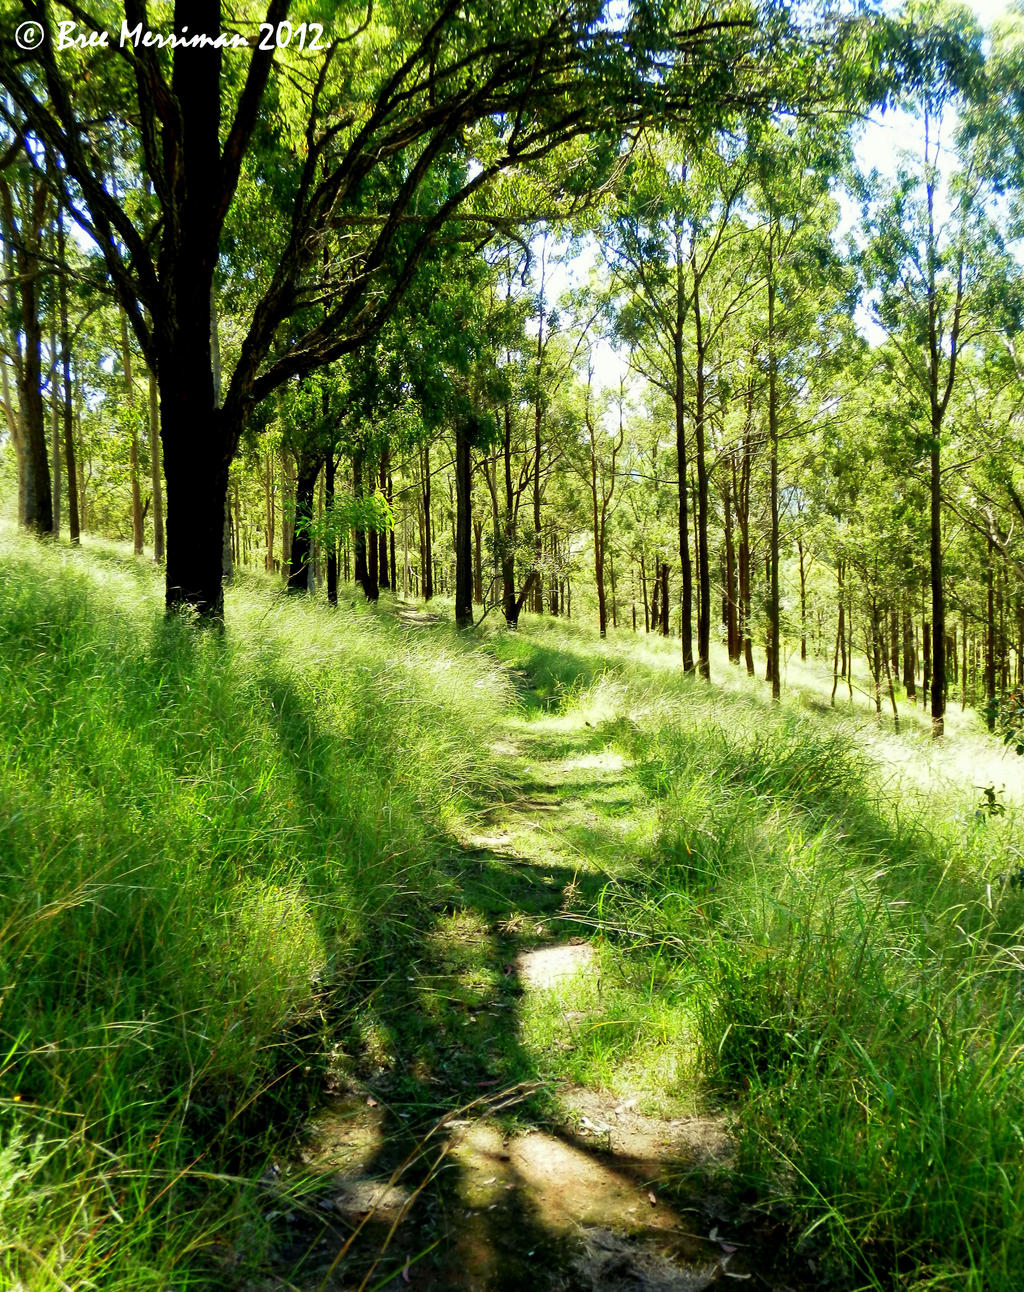 Enlightened Pathway by BreeSpawn